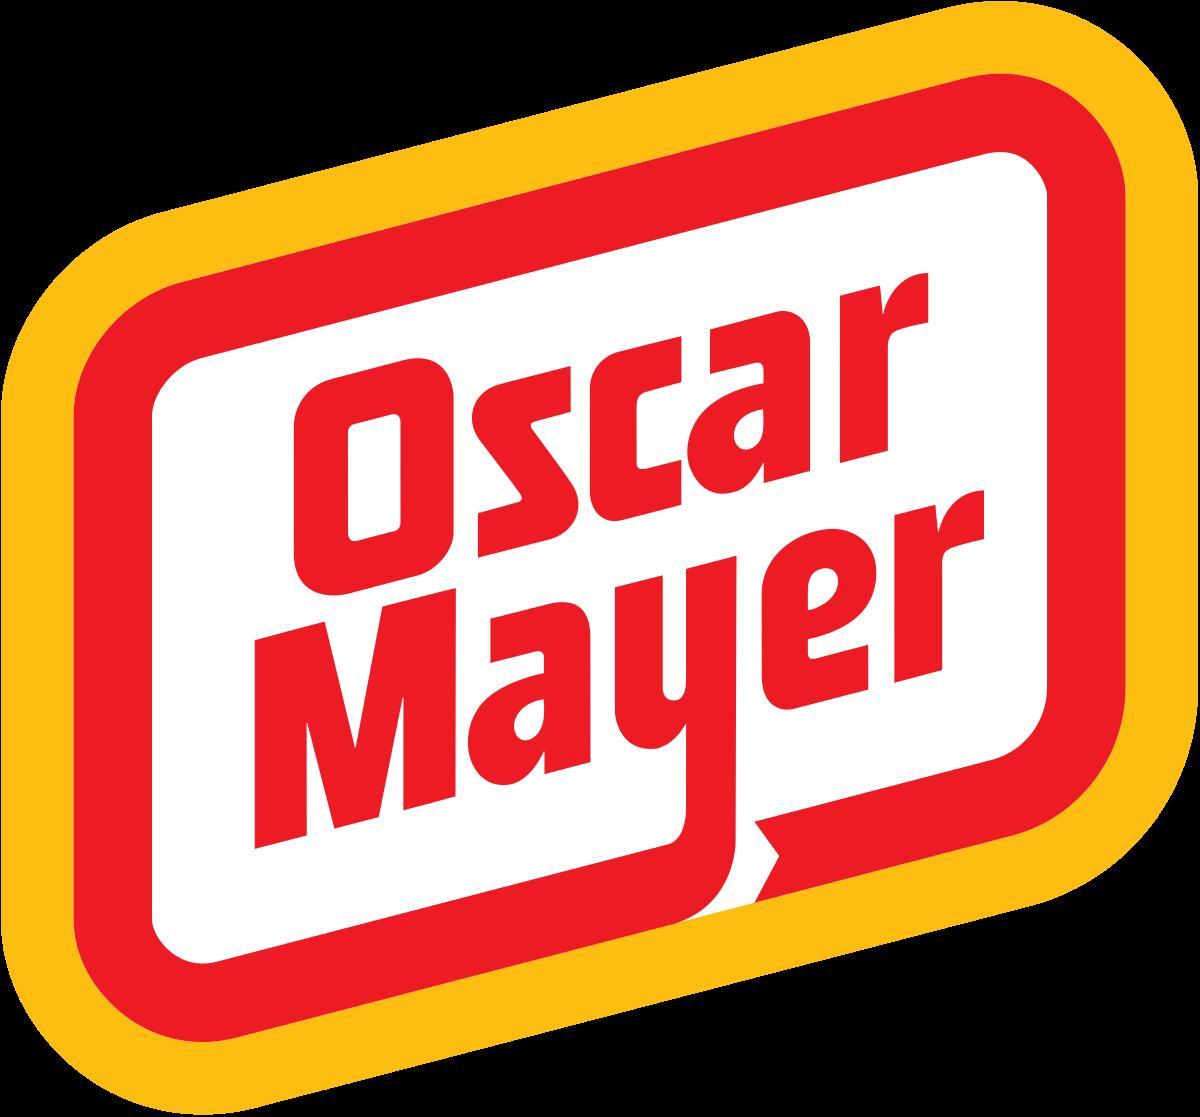 File:Oscar Mayer logo.svg.